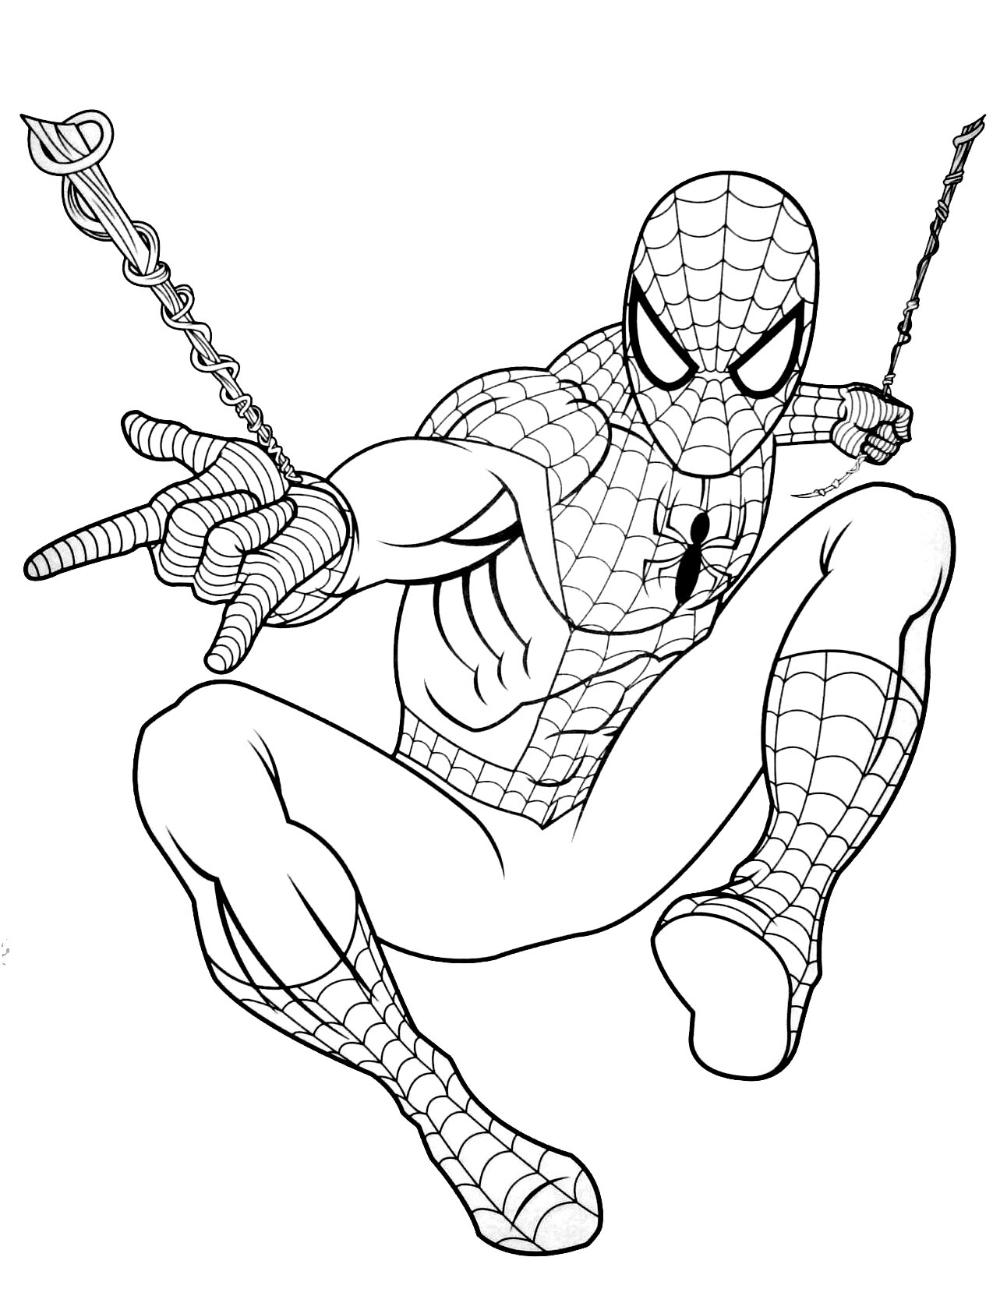 Spiderman Kids Coloring Pages Superhero Coloring Pages Avengers Coloring Pages Spiderman Coloring